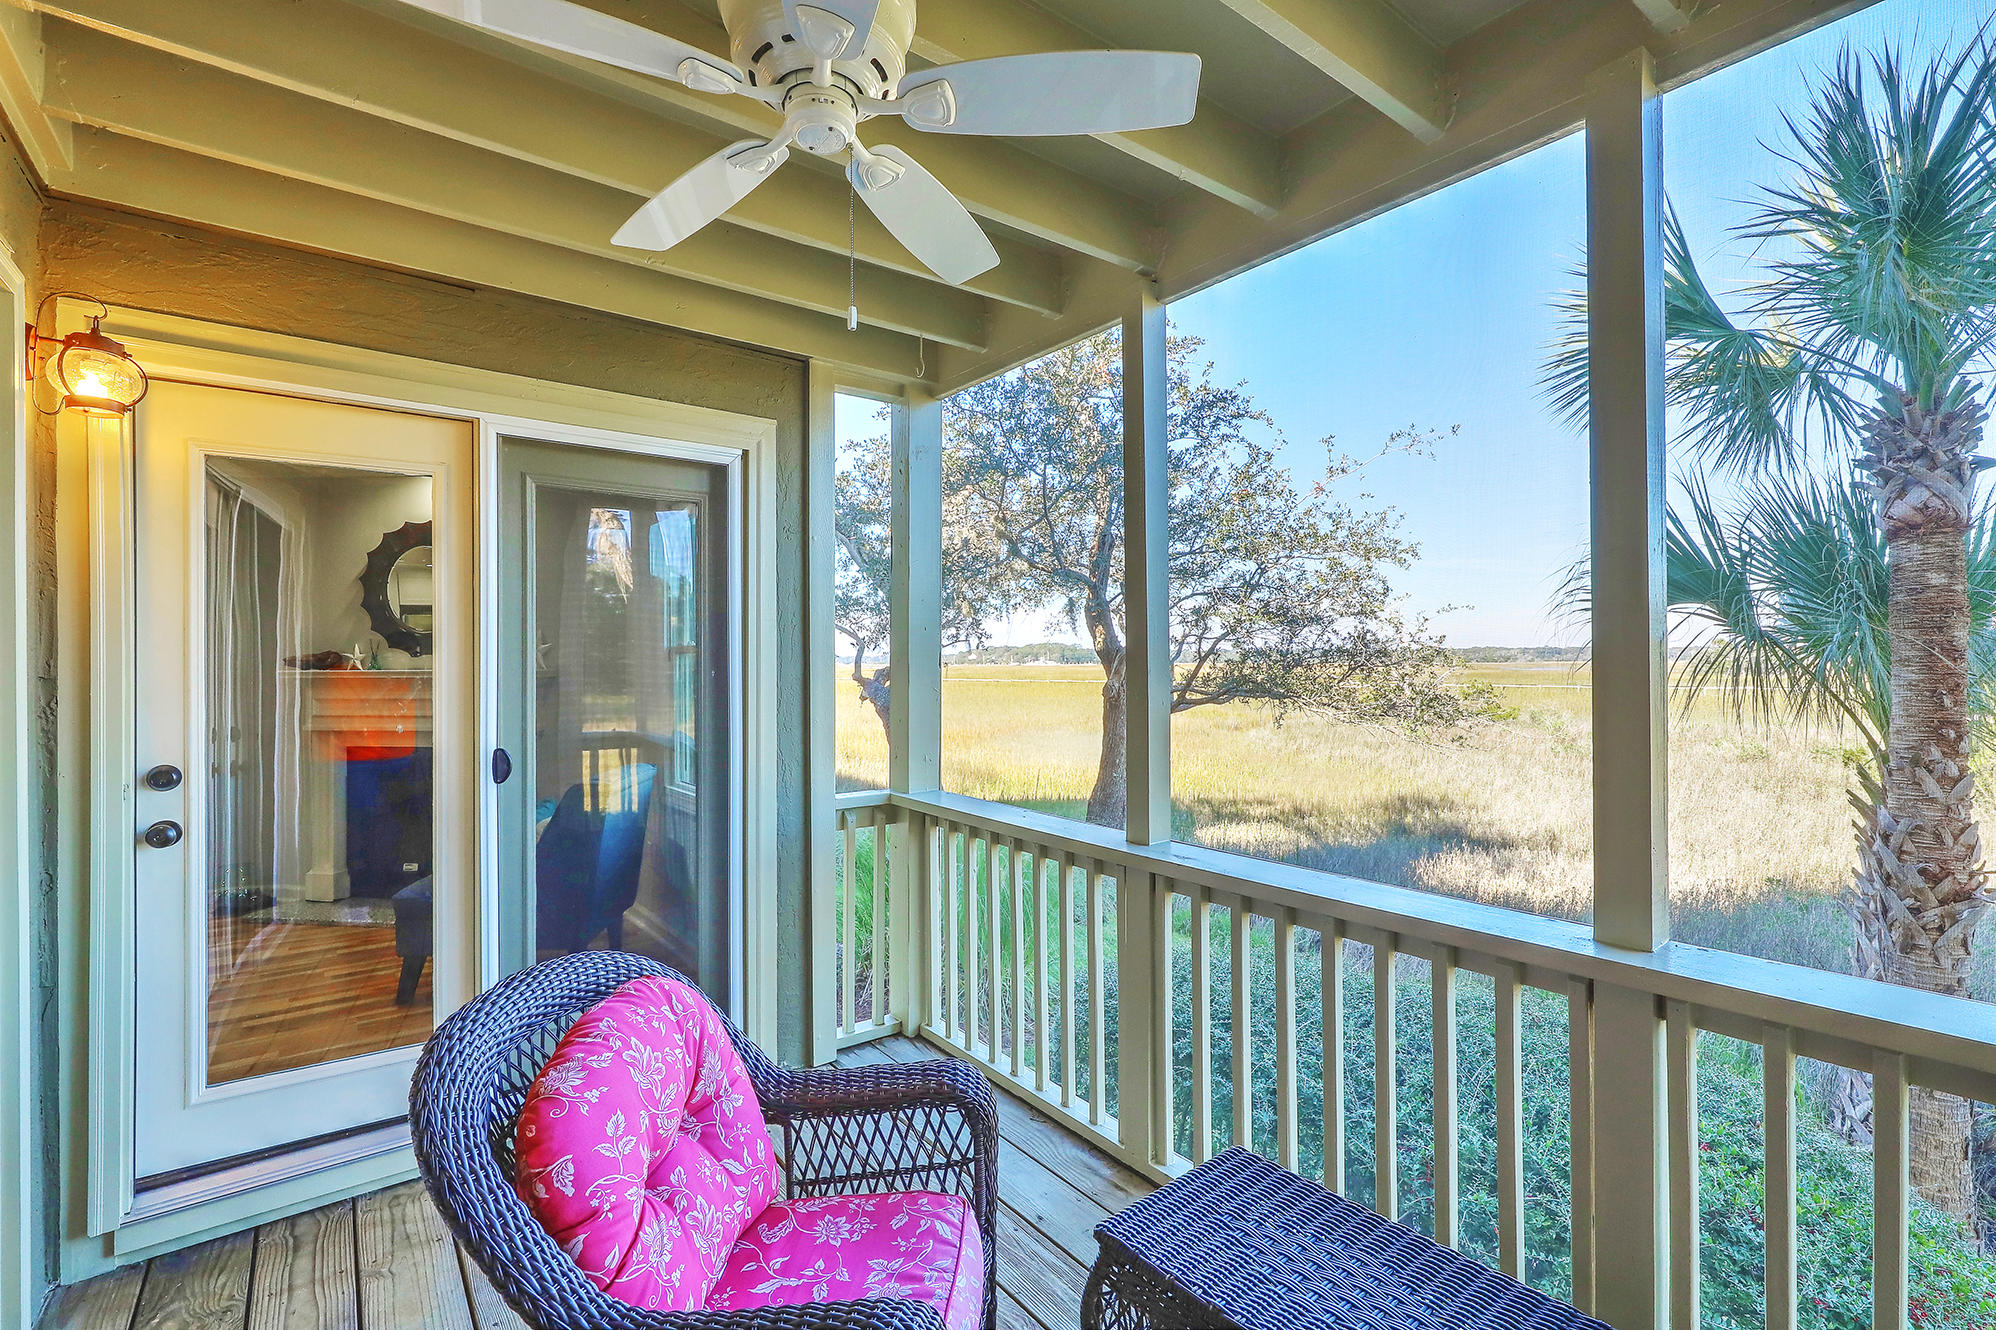 Seabrook Island Homes For Sale - 2103 Landfall, Johns Island, SC - 6